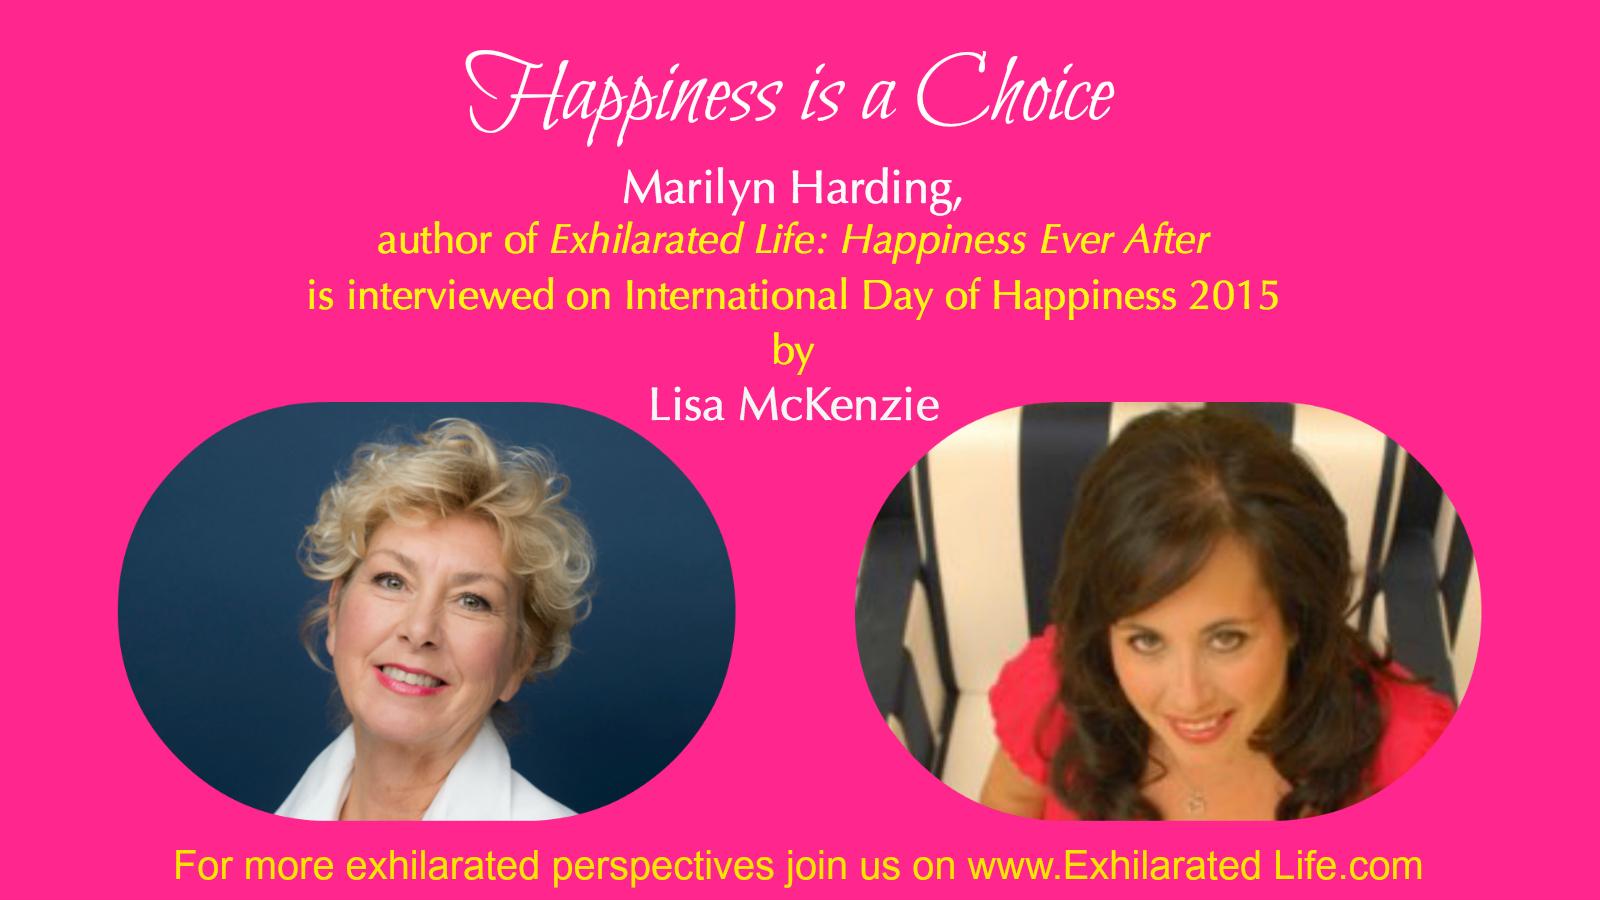 Marilyn Harding with Lisa McKenzie